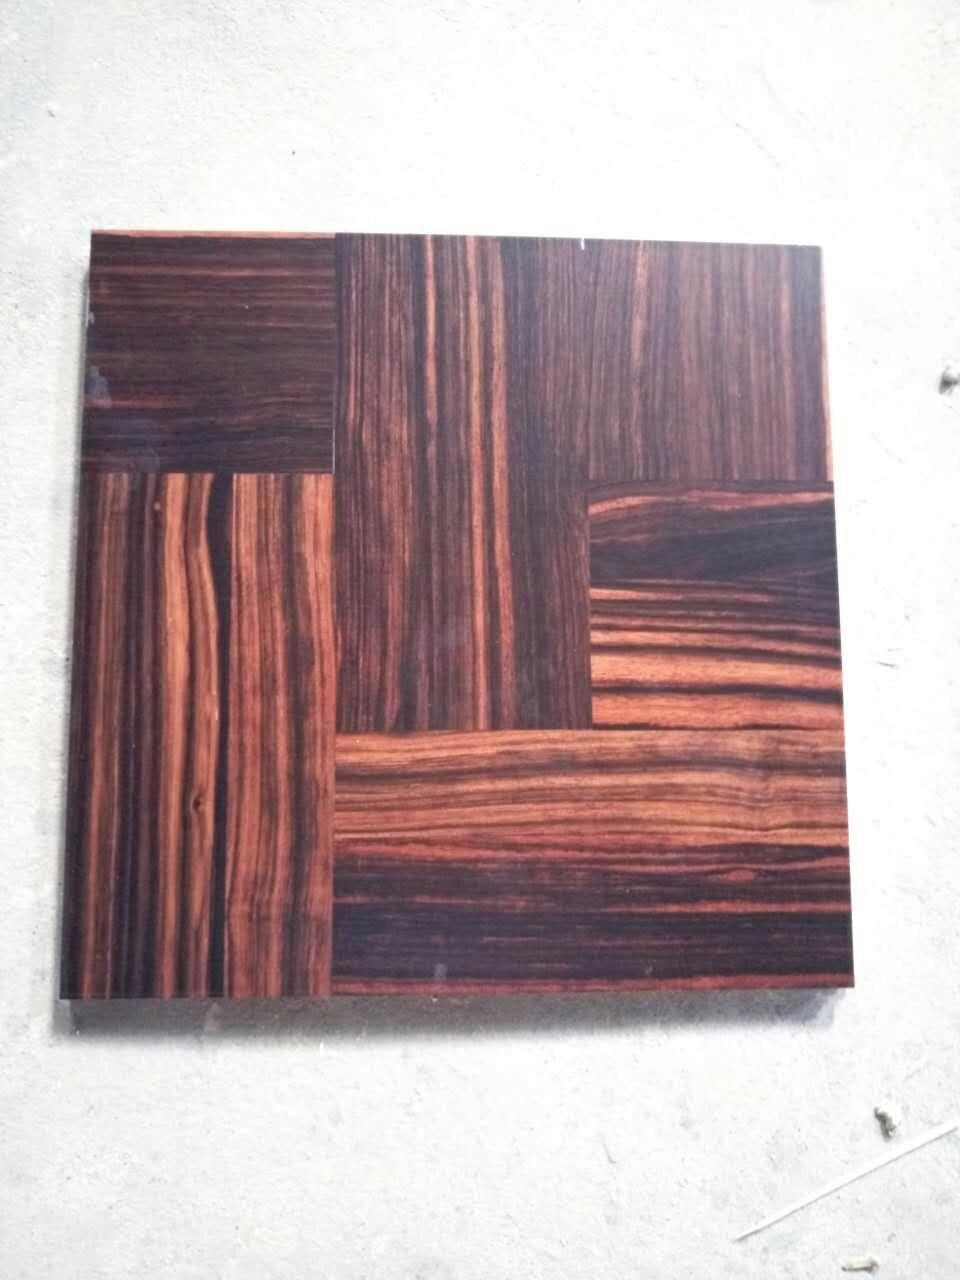 Ebony floor fight flowers Art Parquet Polygon Wood Flooring Custom wood floor Black walnut birch wood flooring Oak Merbau wood Nat